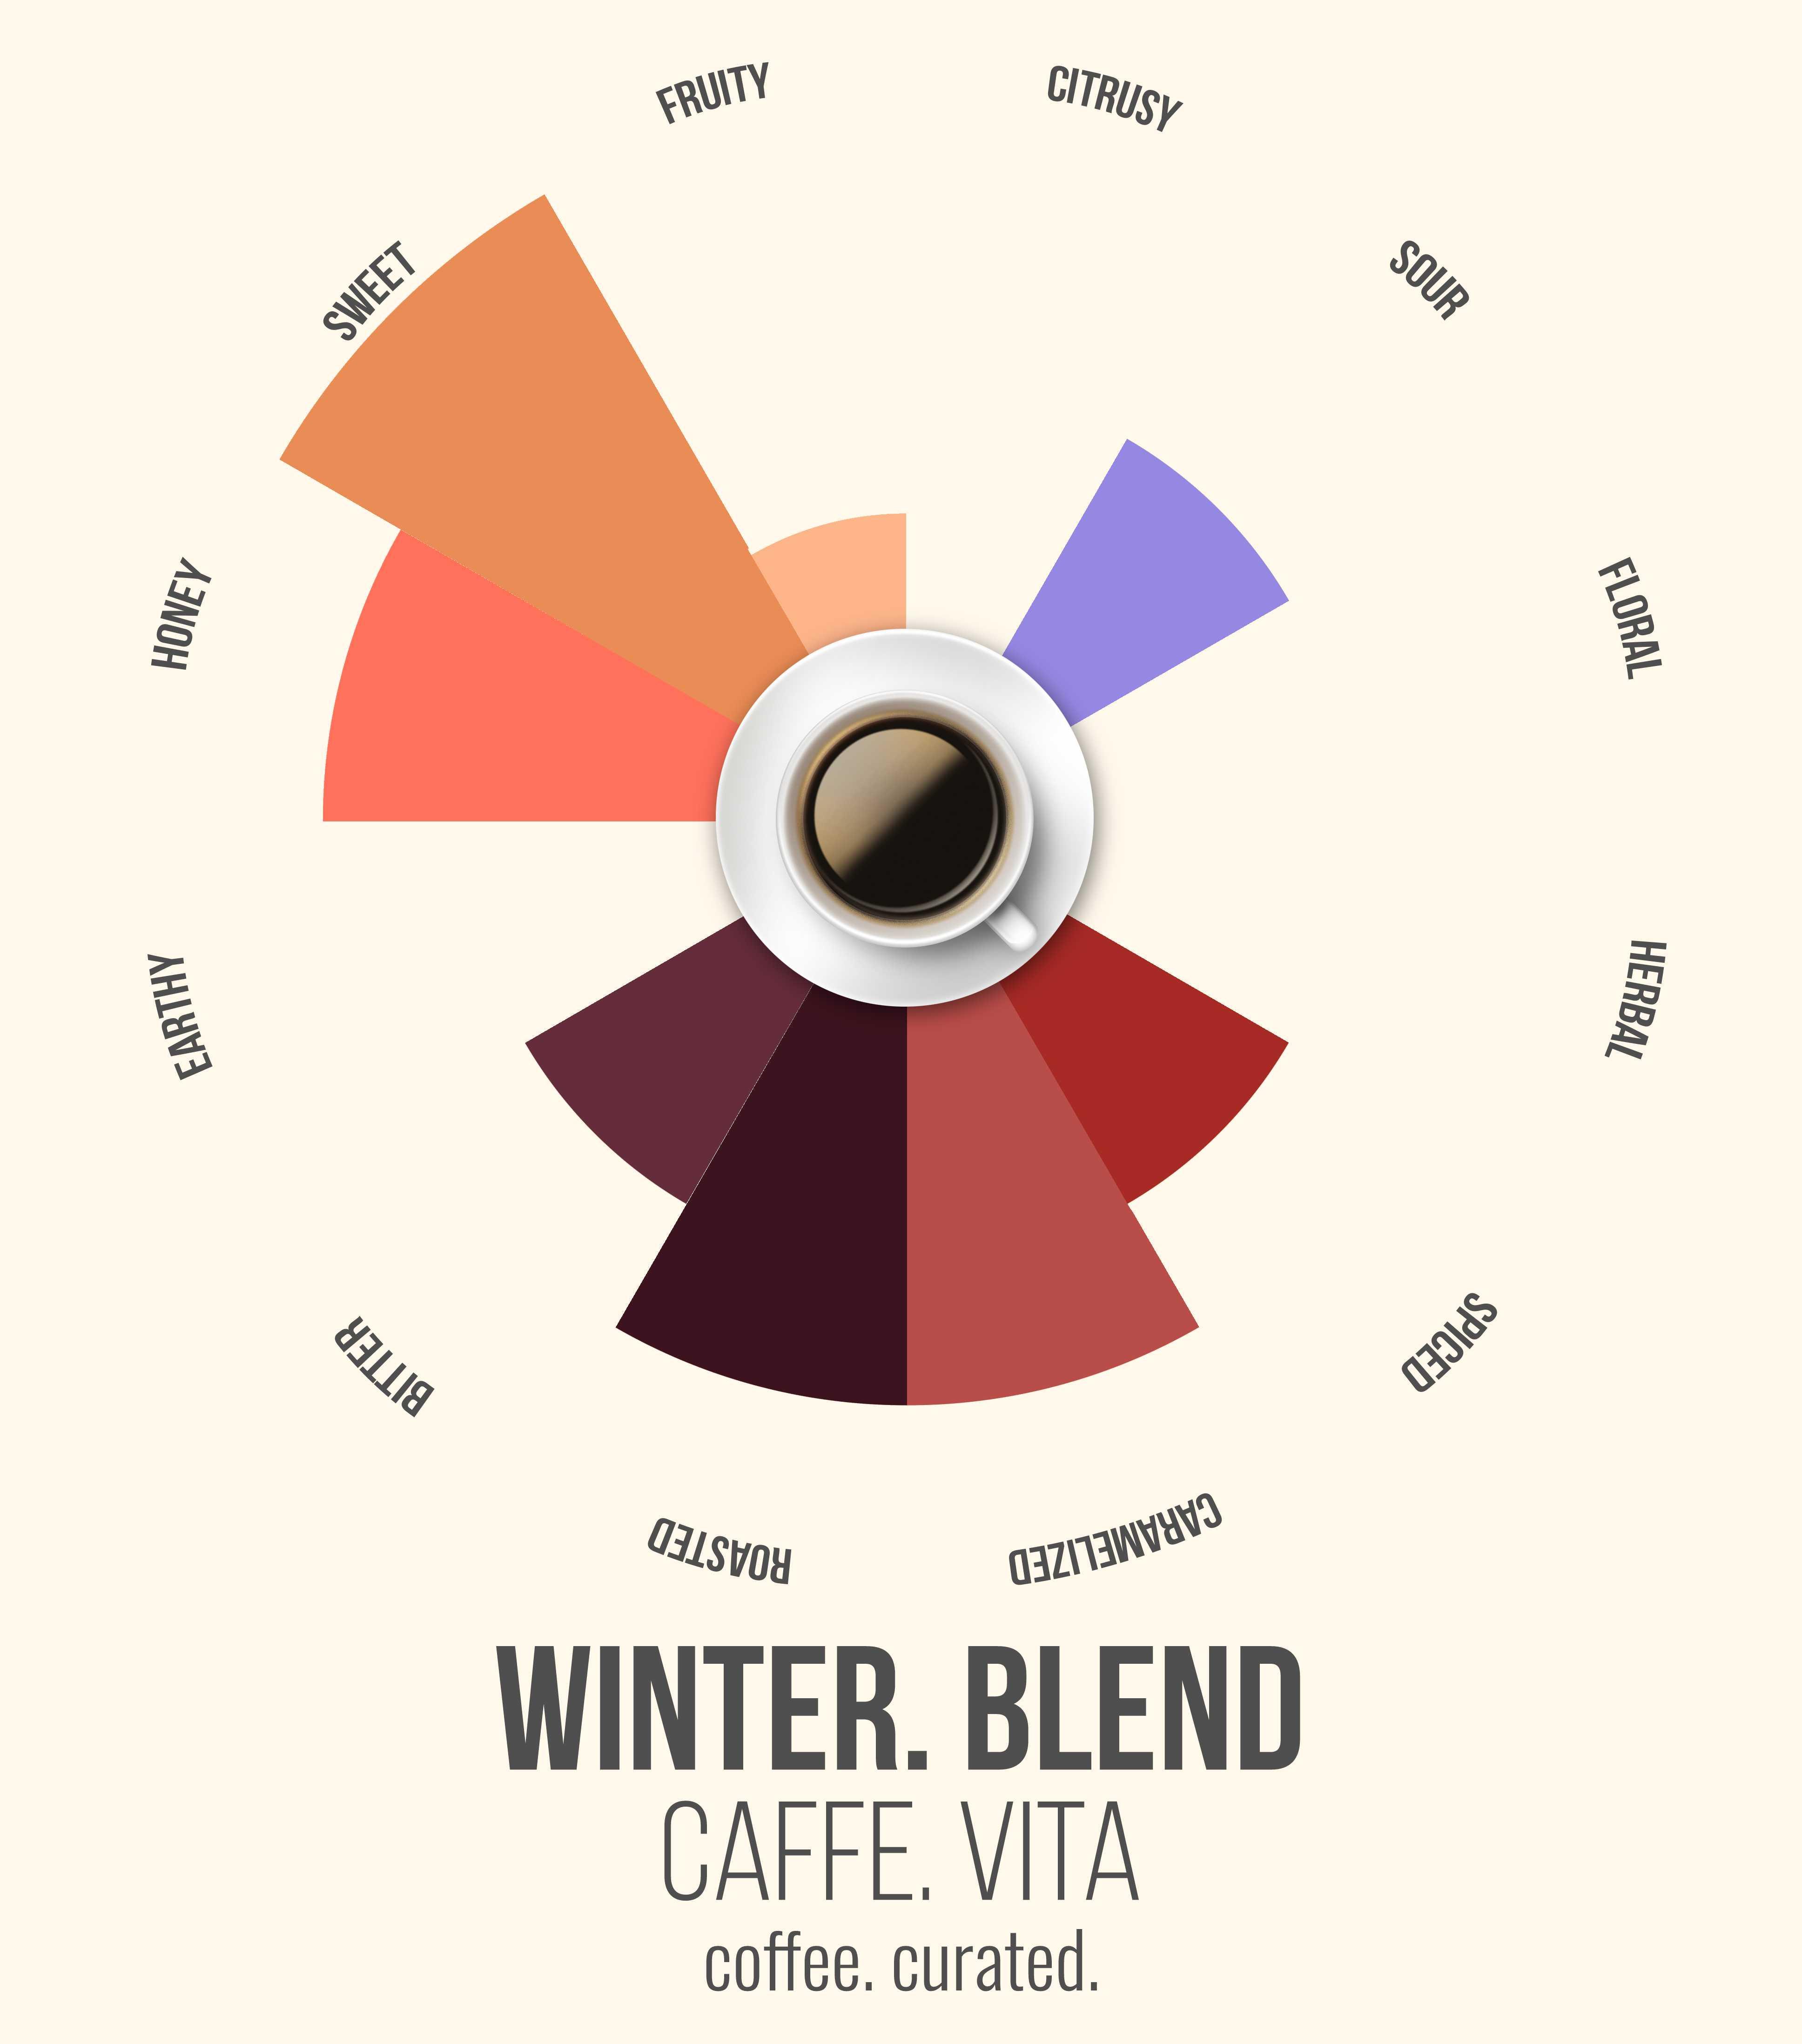 Caffe Vita WINTER Blend